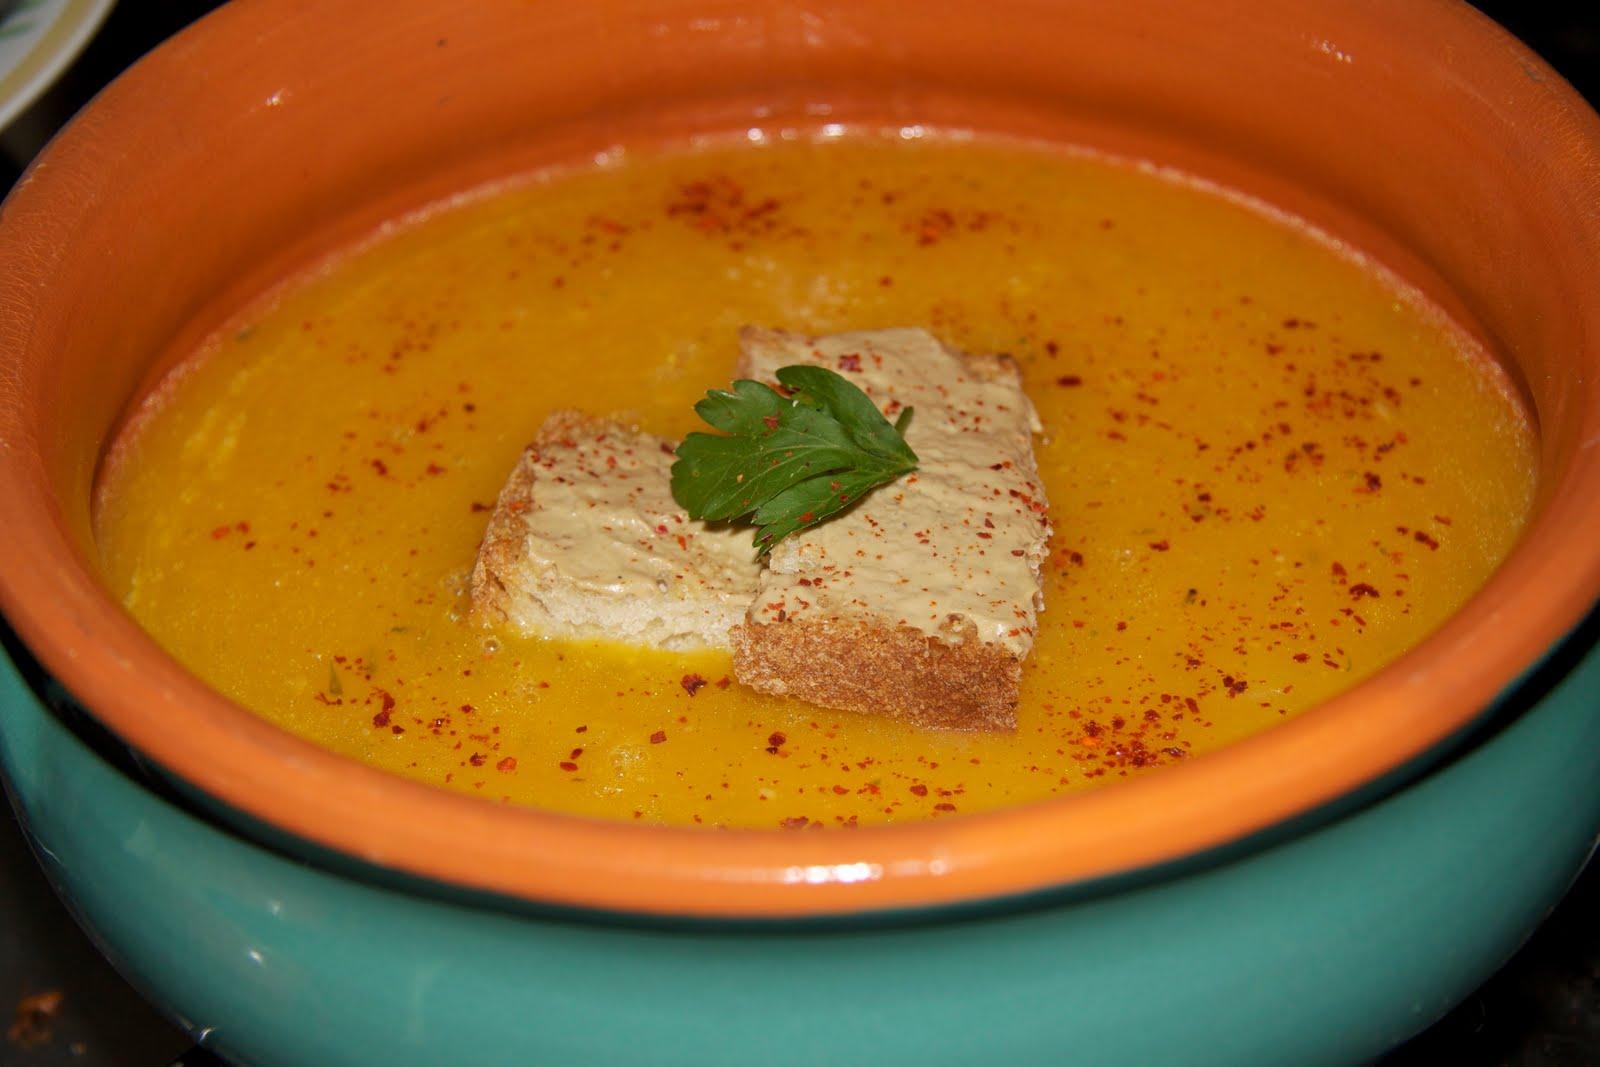 Ricette curiose: una densa e cremosa zuppa di zucca